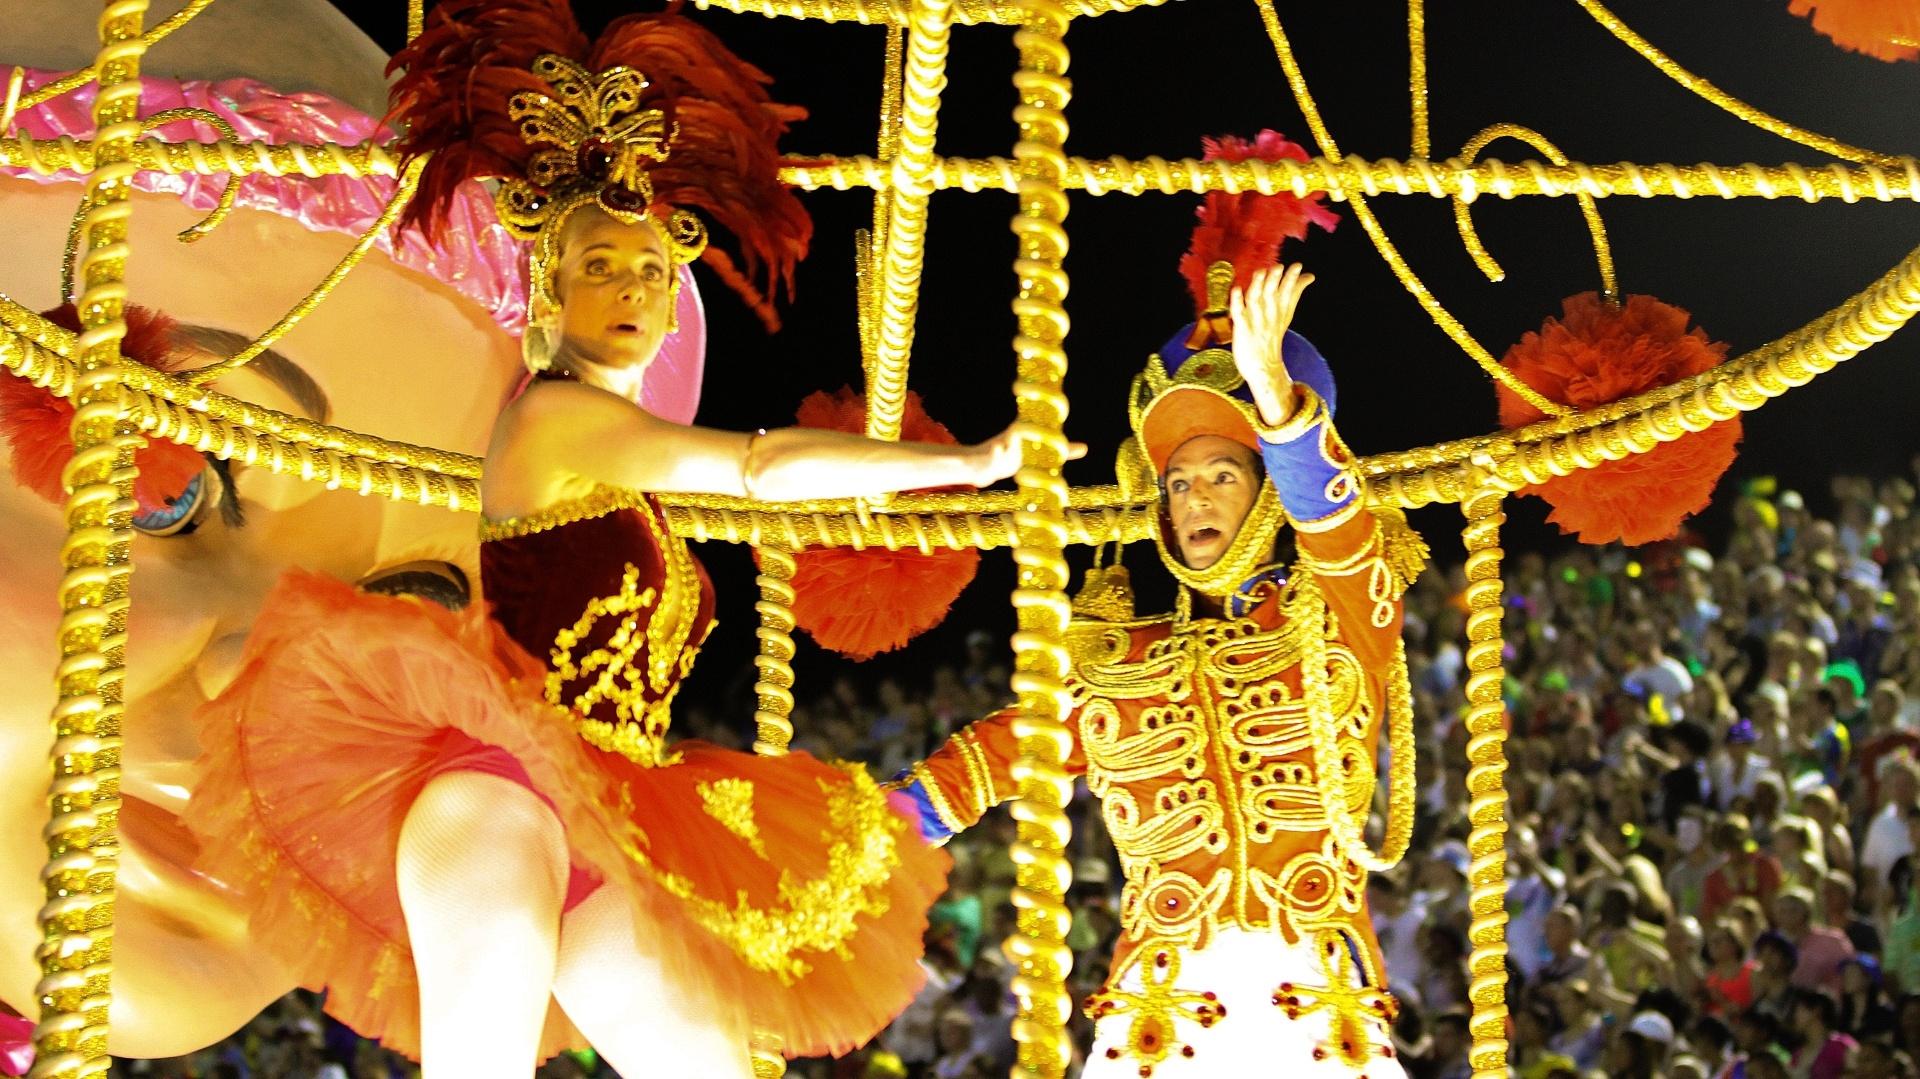 3.mar.2014 - Letícia Spiller e o bailarino Bruno César com a fantasia